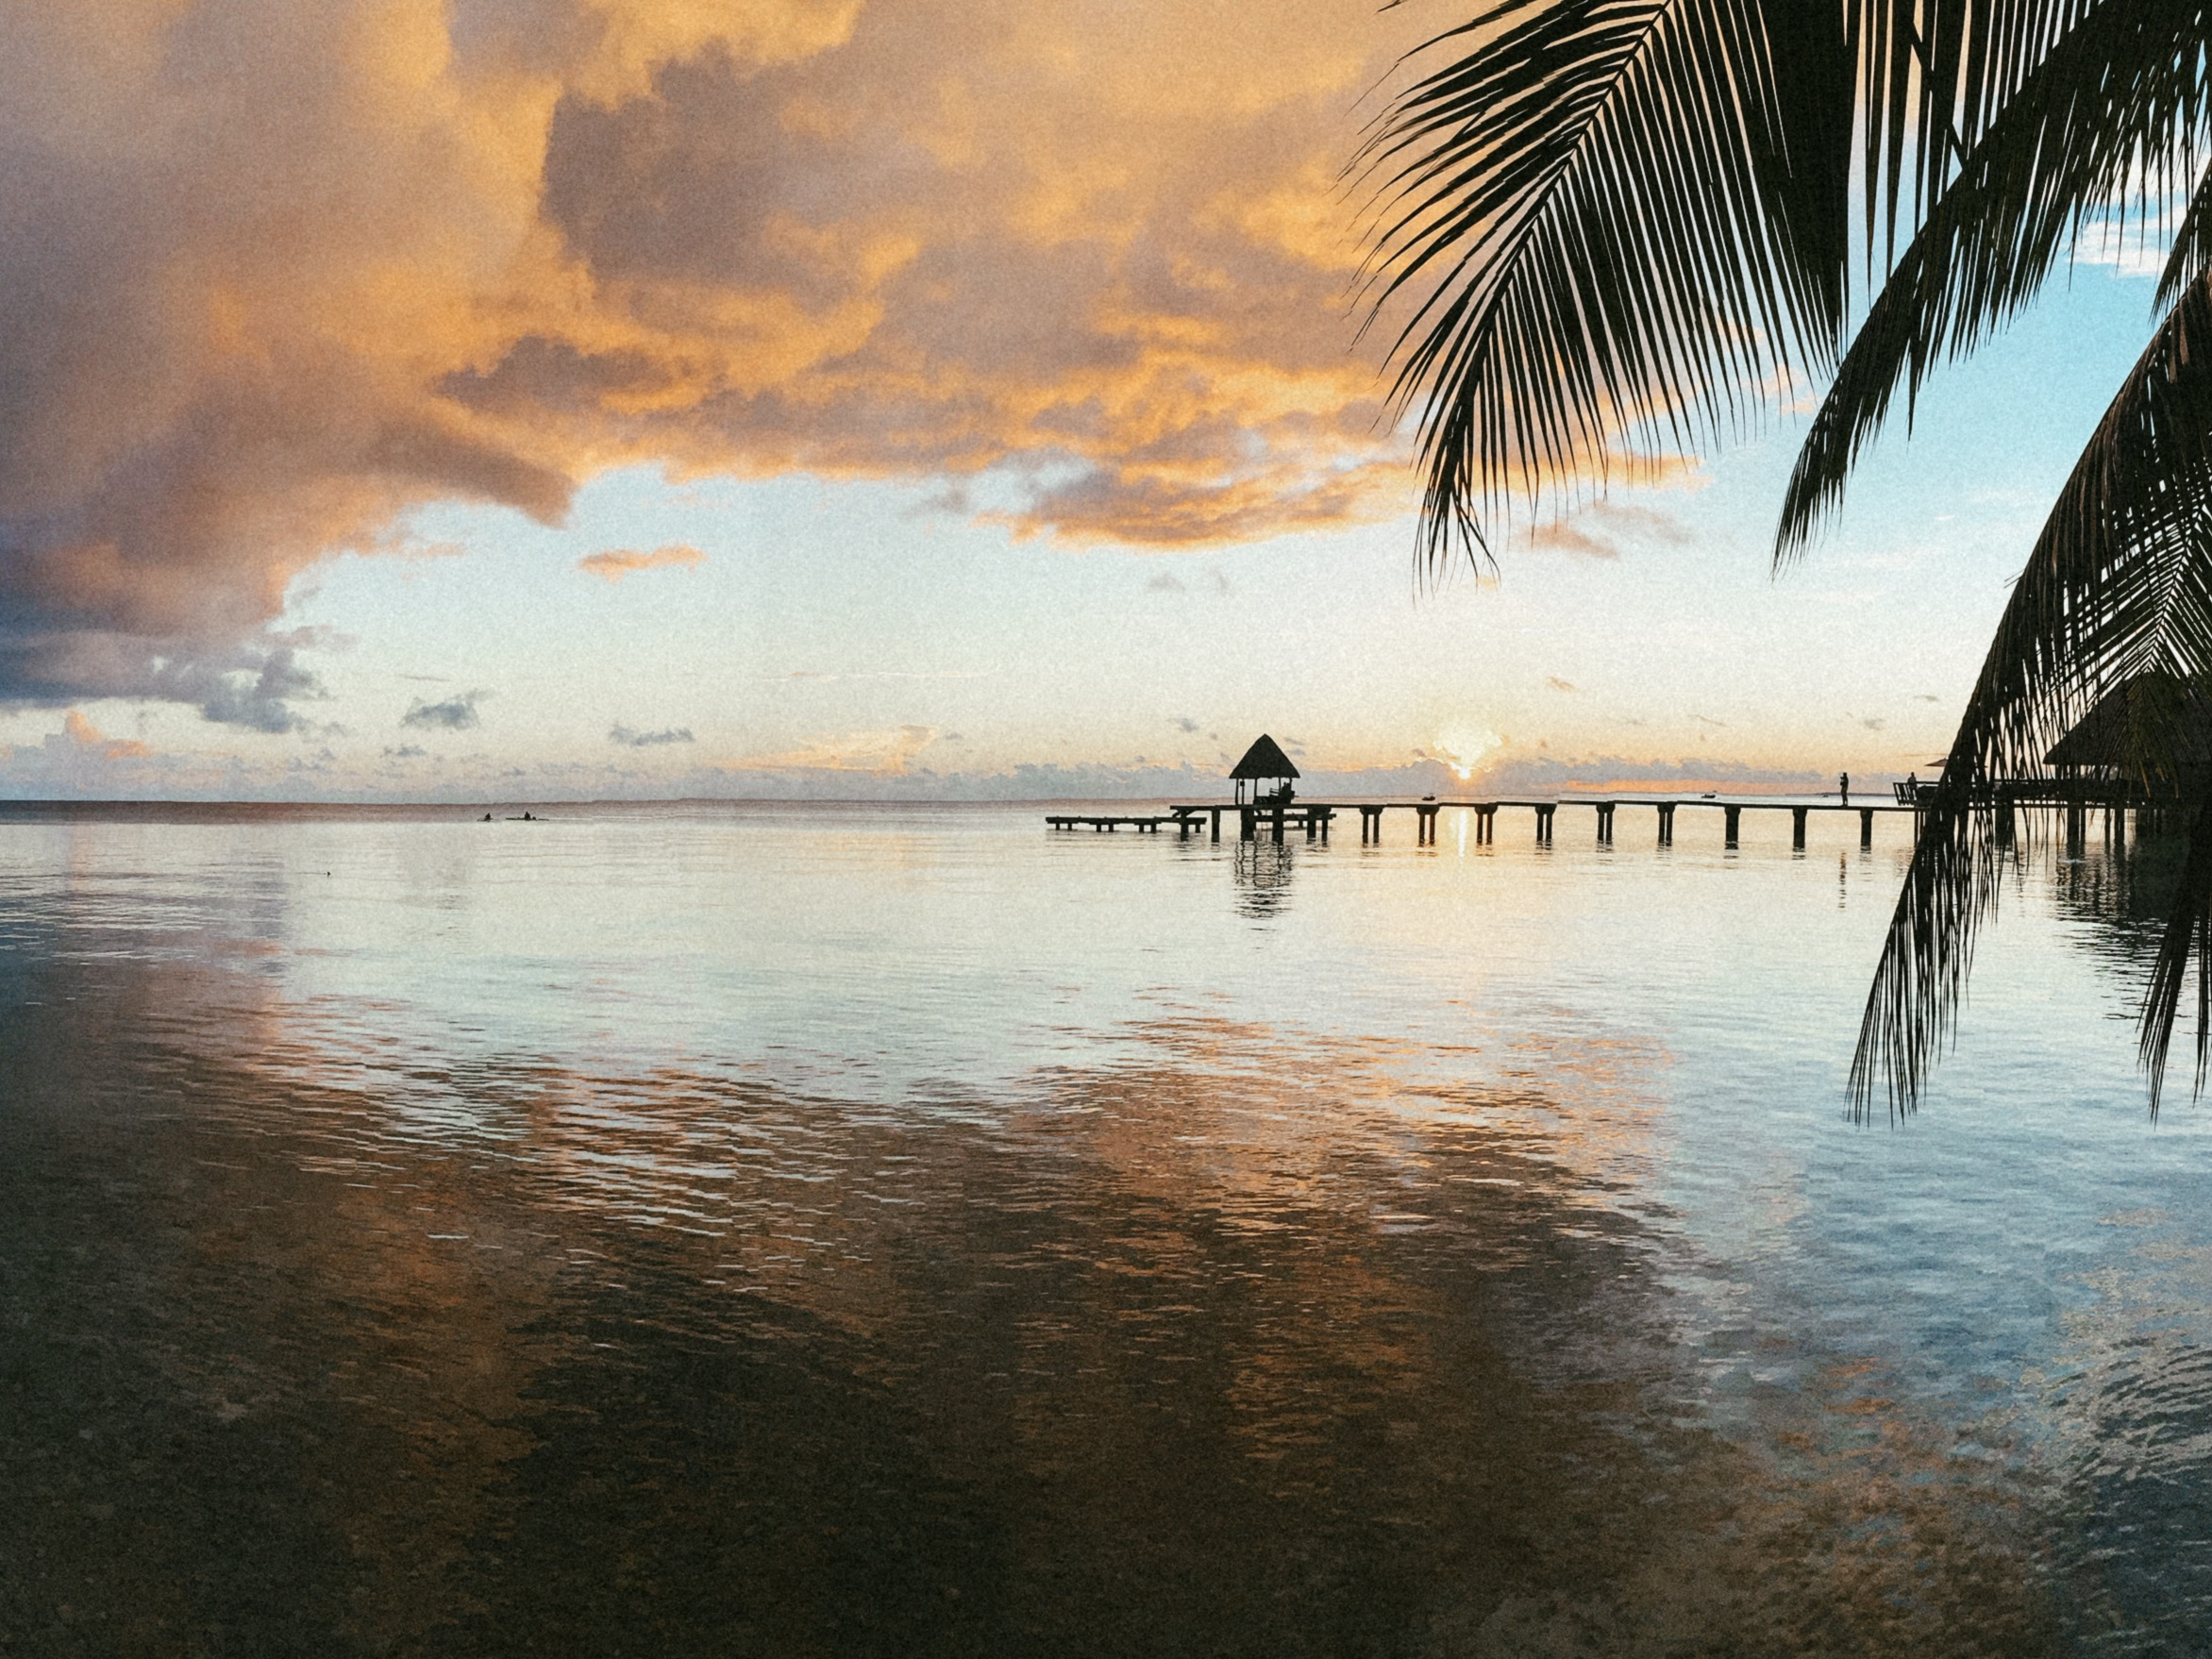 Sunset over lagoon in Rangiroa French Polynesia